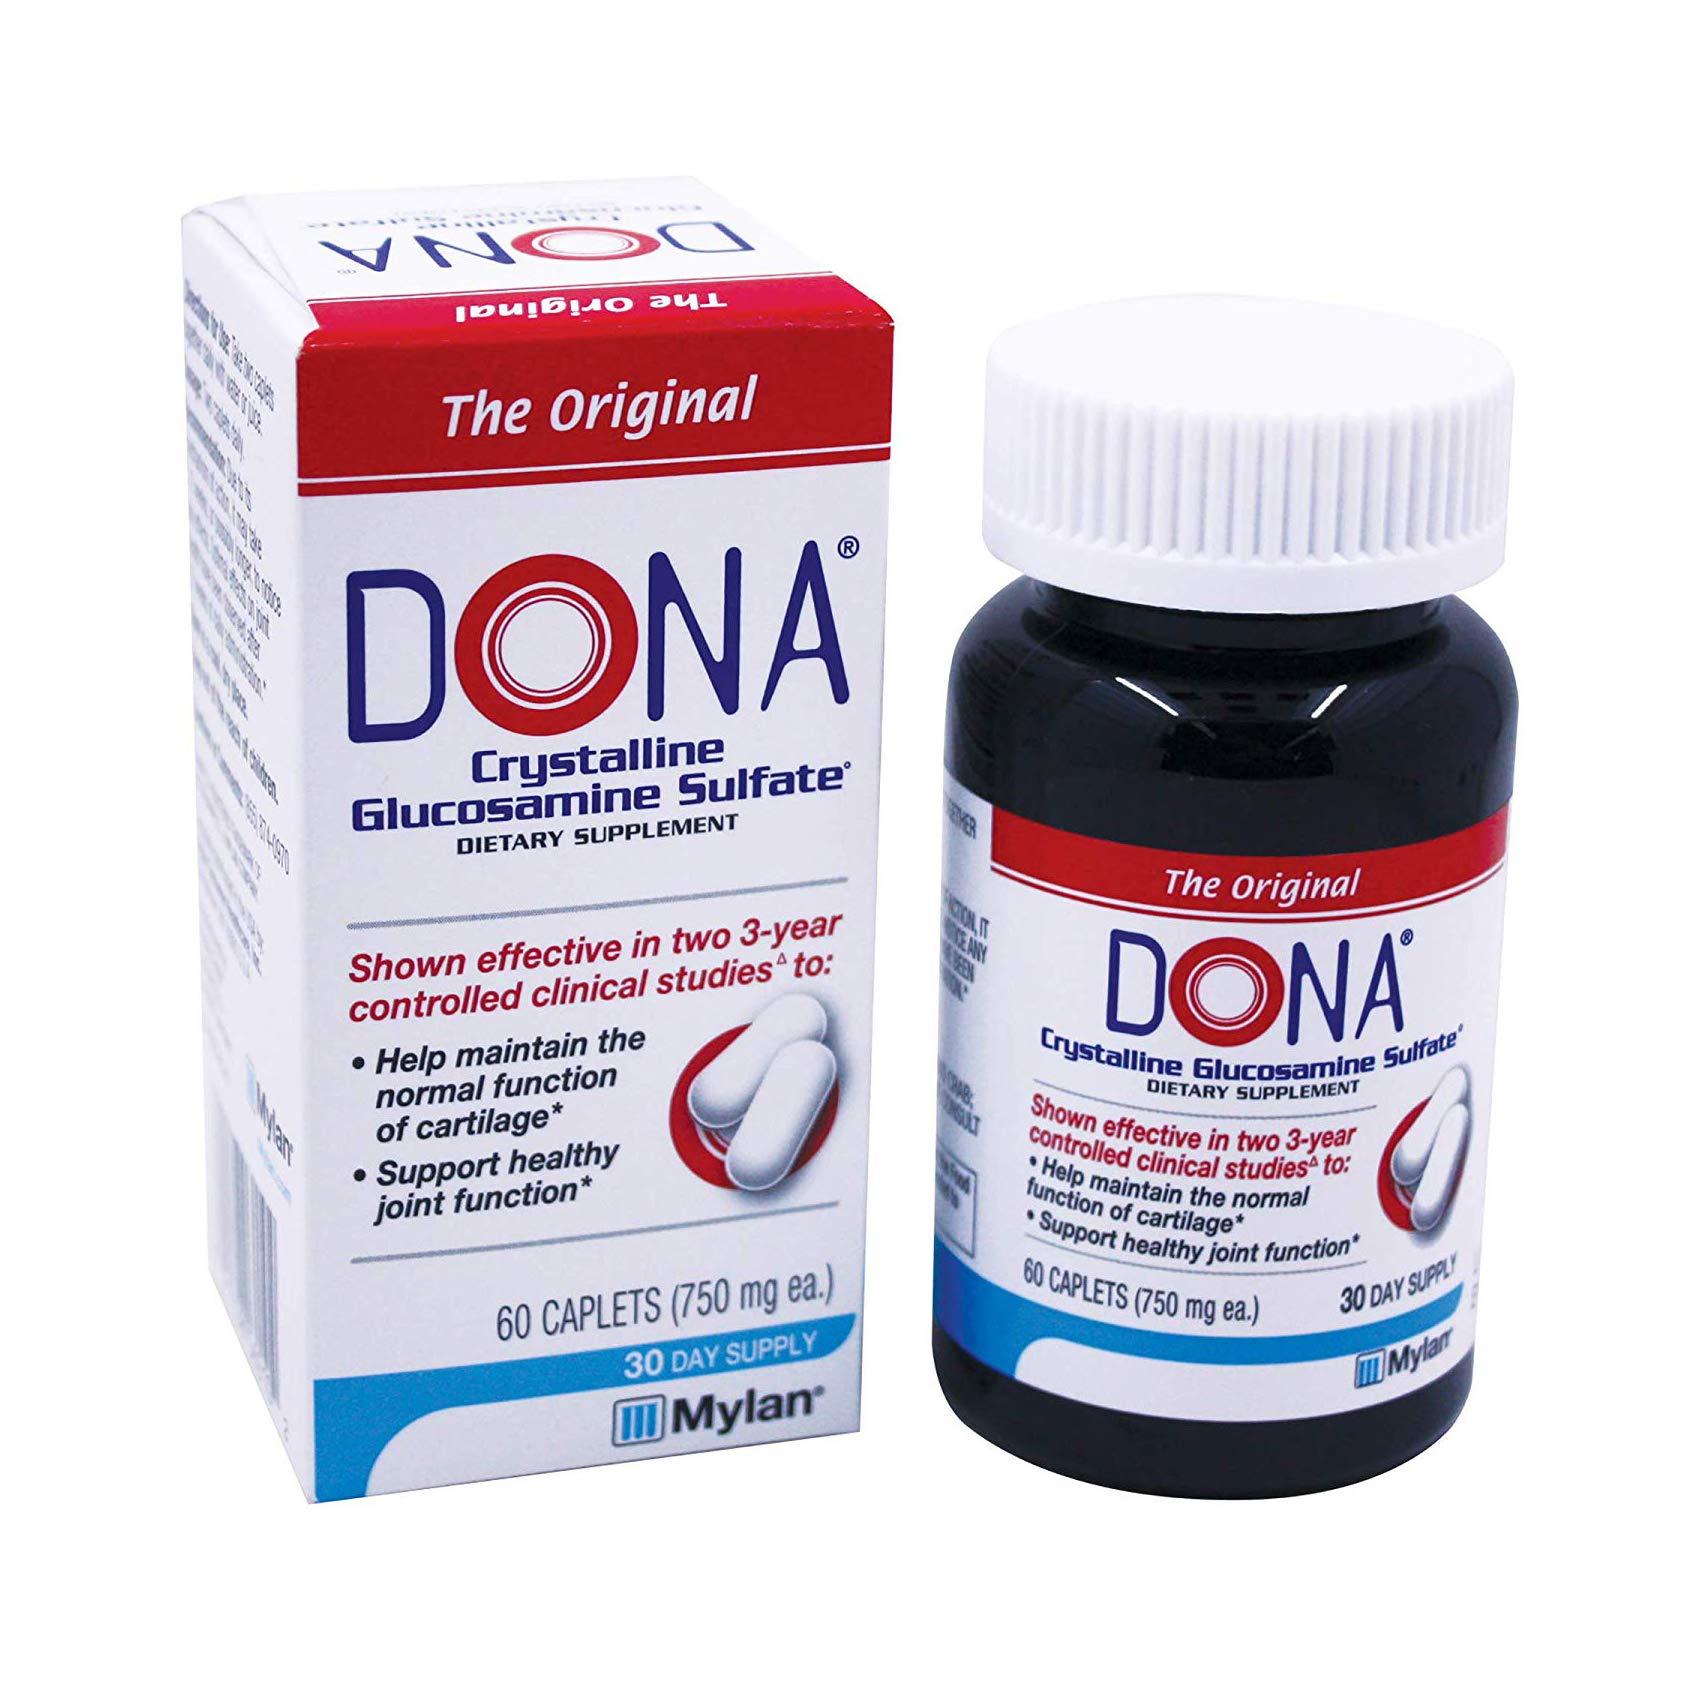 Dona Crystalline Glucosamine Sulfate, 750 Mg, 60 Count by DONA (Image #1)